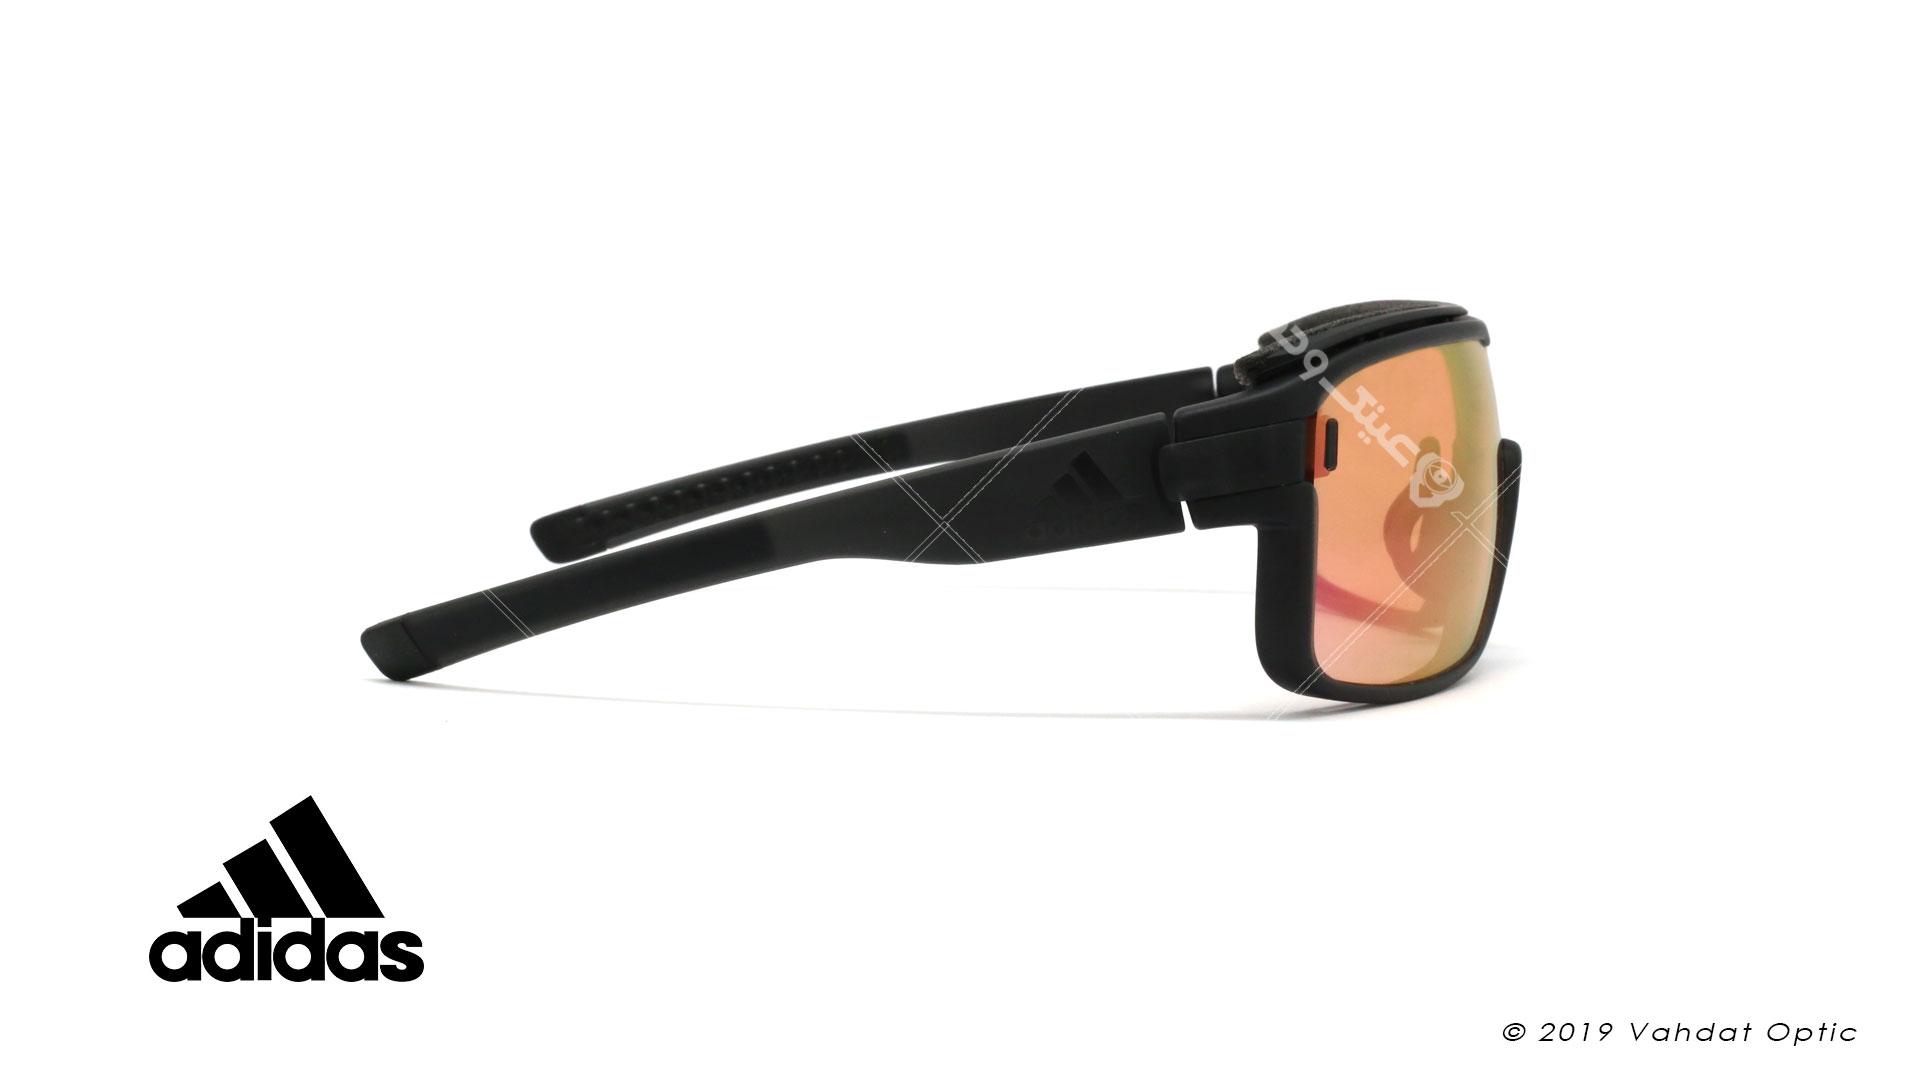 35c7af4d8ec2 عینک آفتابی ورزشی آدیداس - Adidas AD02 6059   بازرگانی اپتیک وحدت